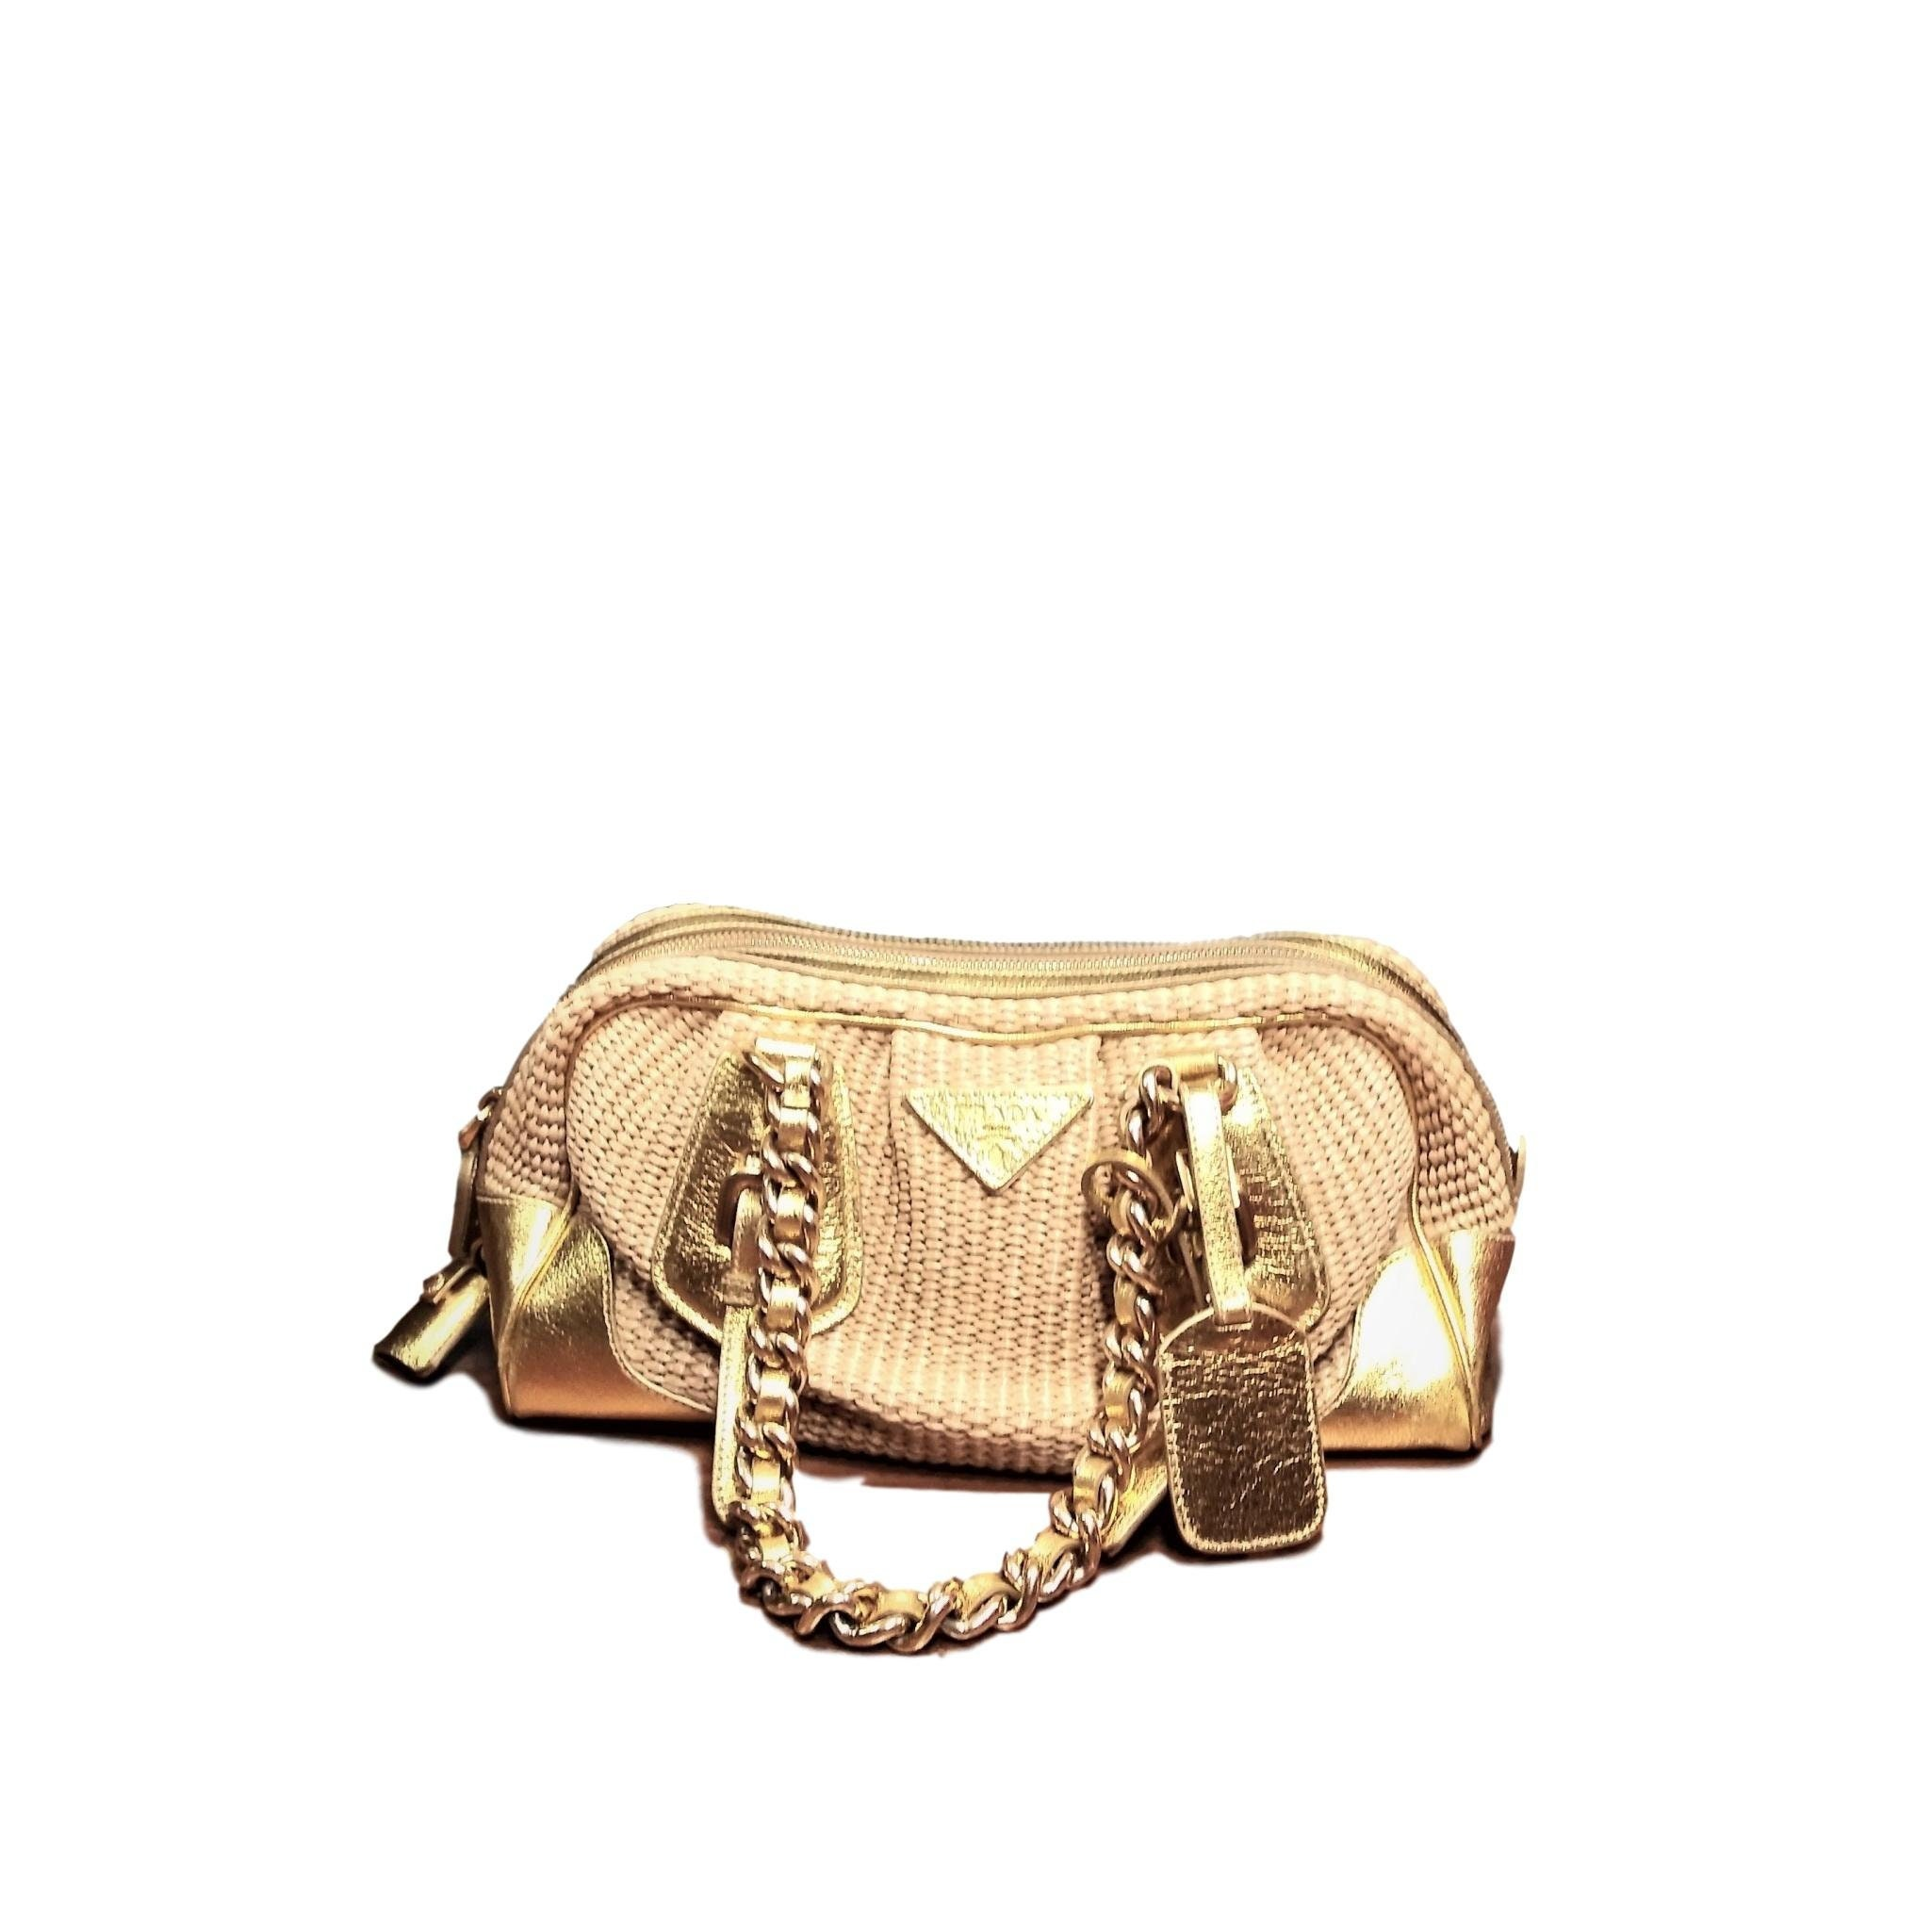 77e2b2334711 Prada Paglia Cinghiale Zip Top Shoulder Bag-Vintage Prada   Etsy